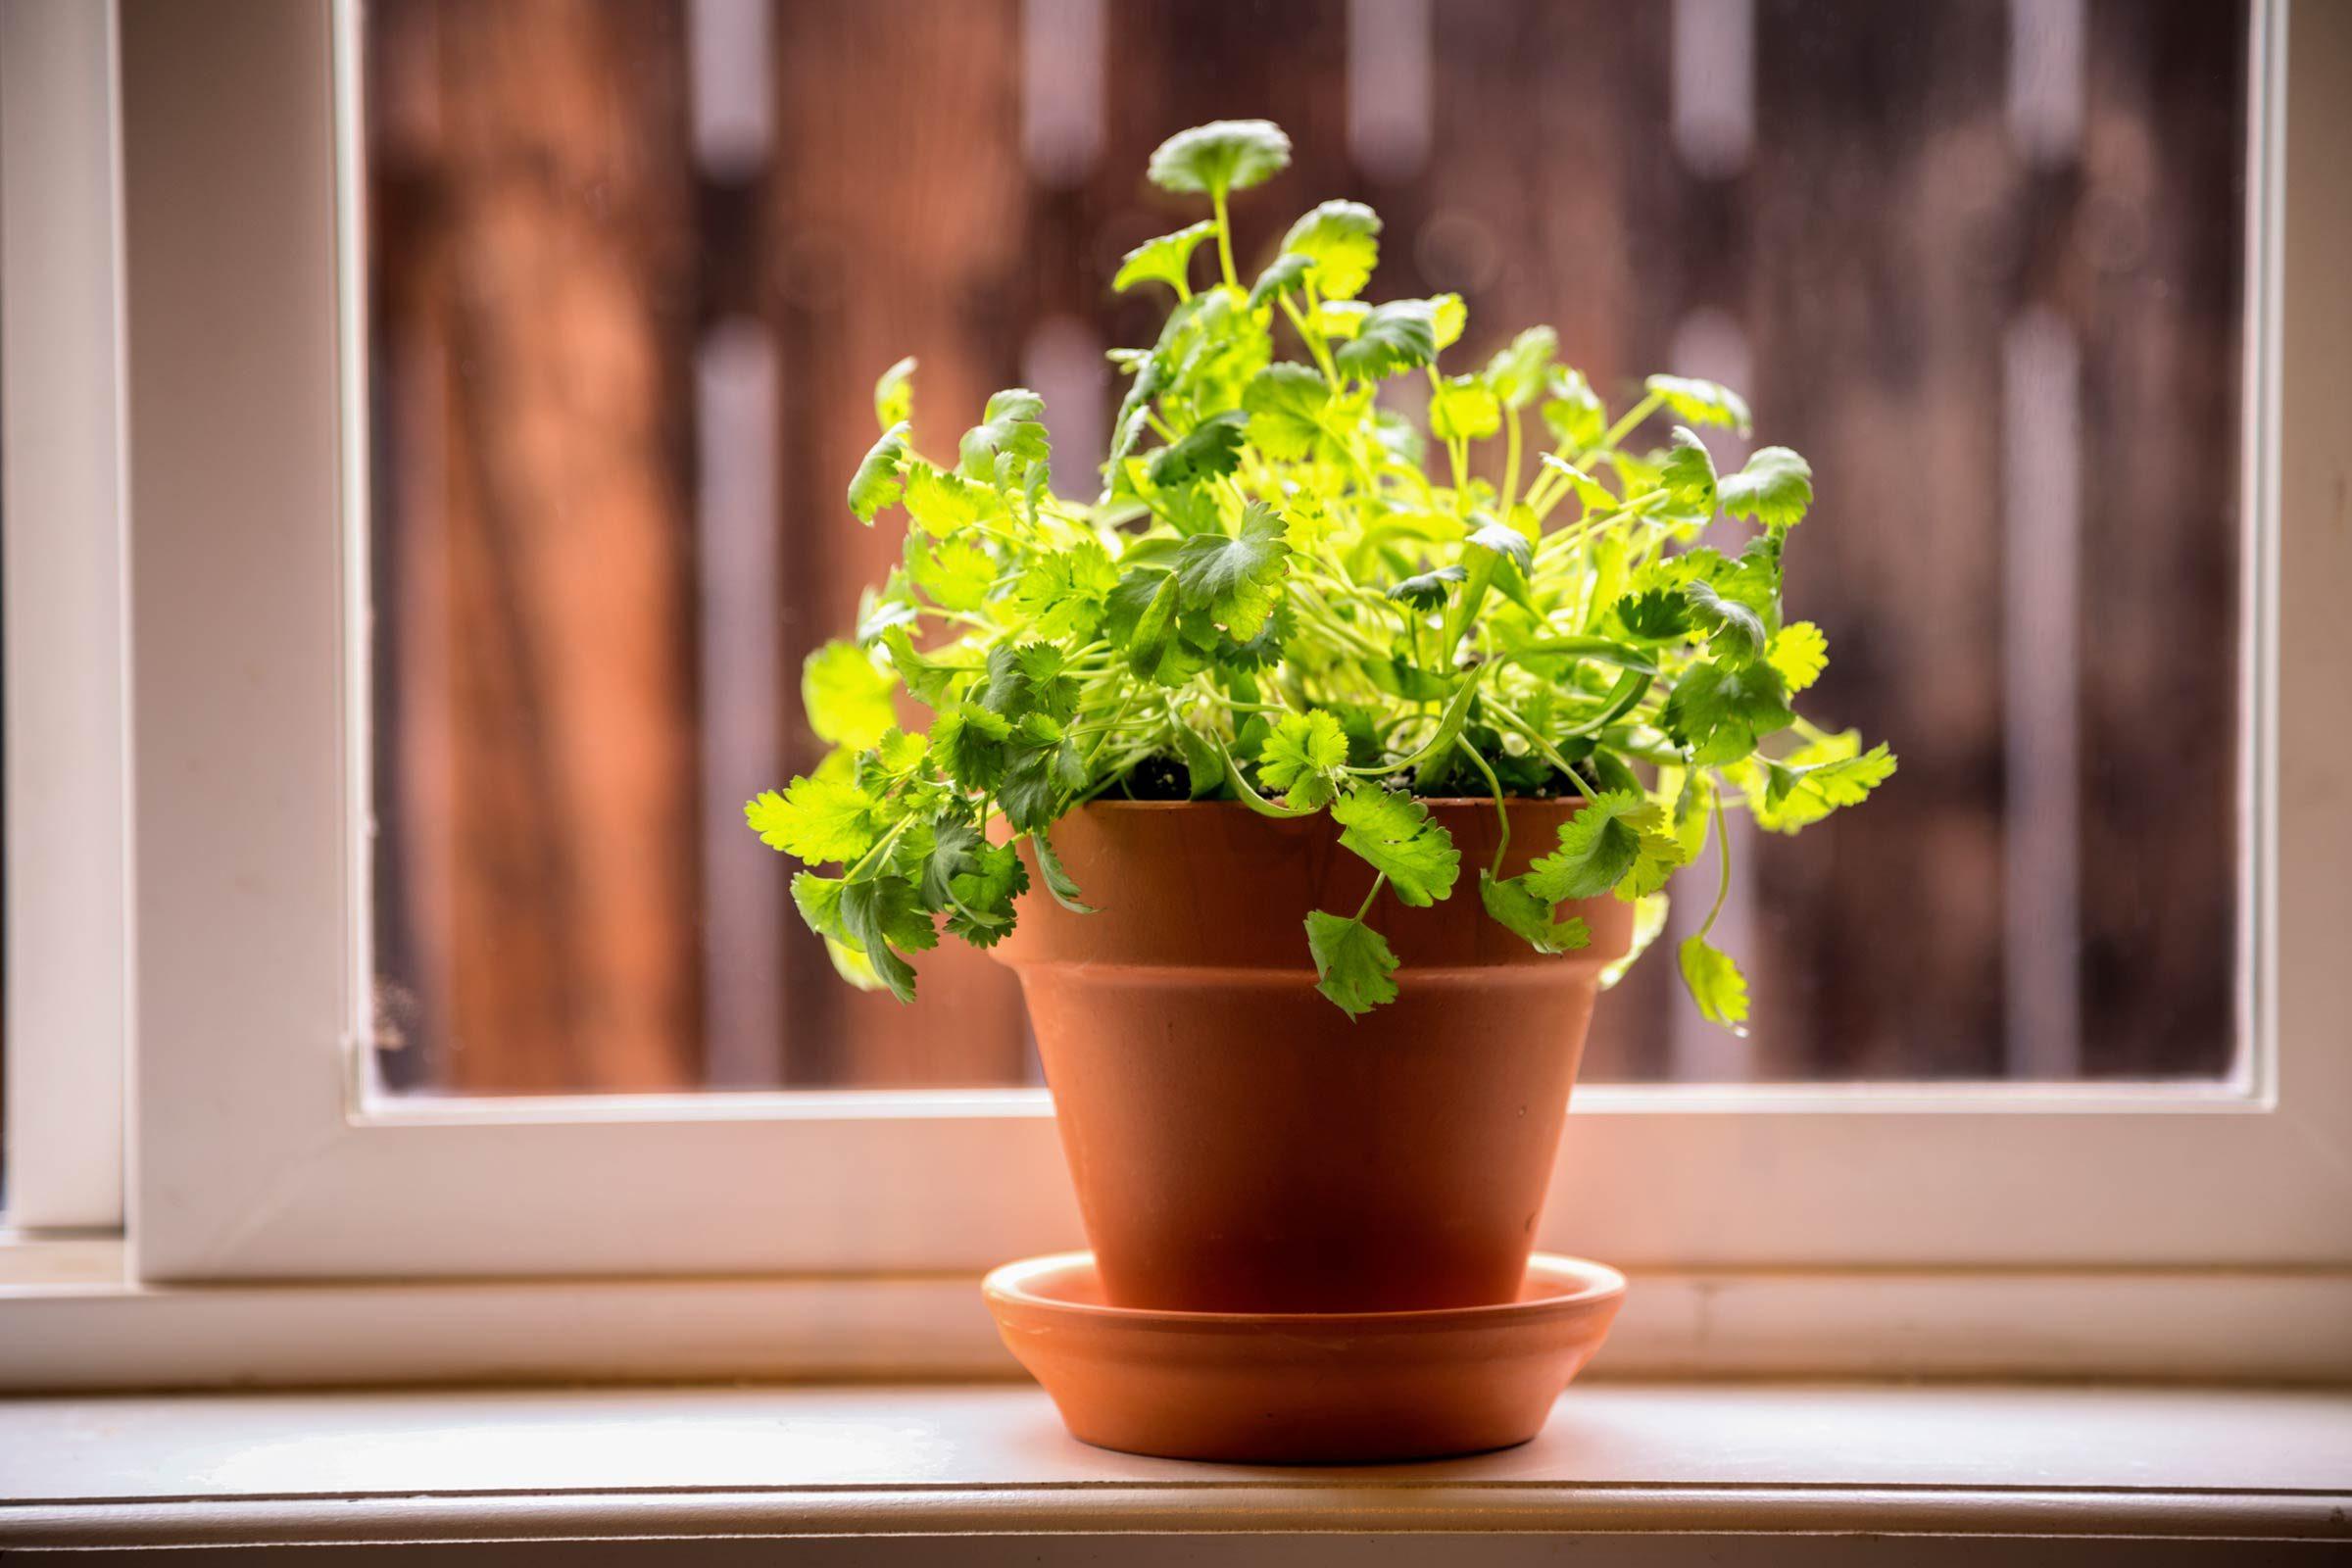 growing plants indoors 29 tips for houseplants reader u0027s digest